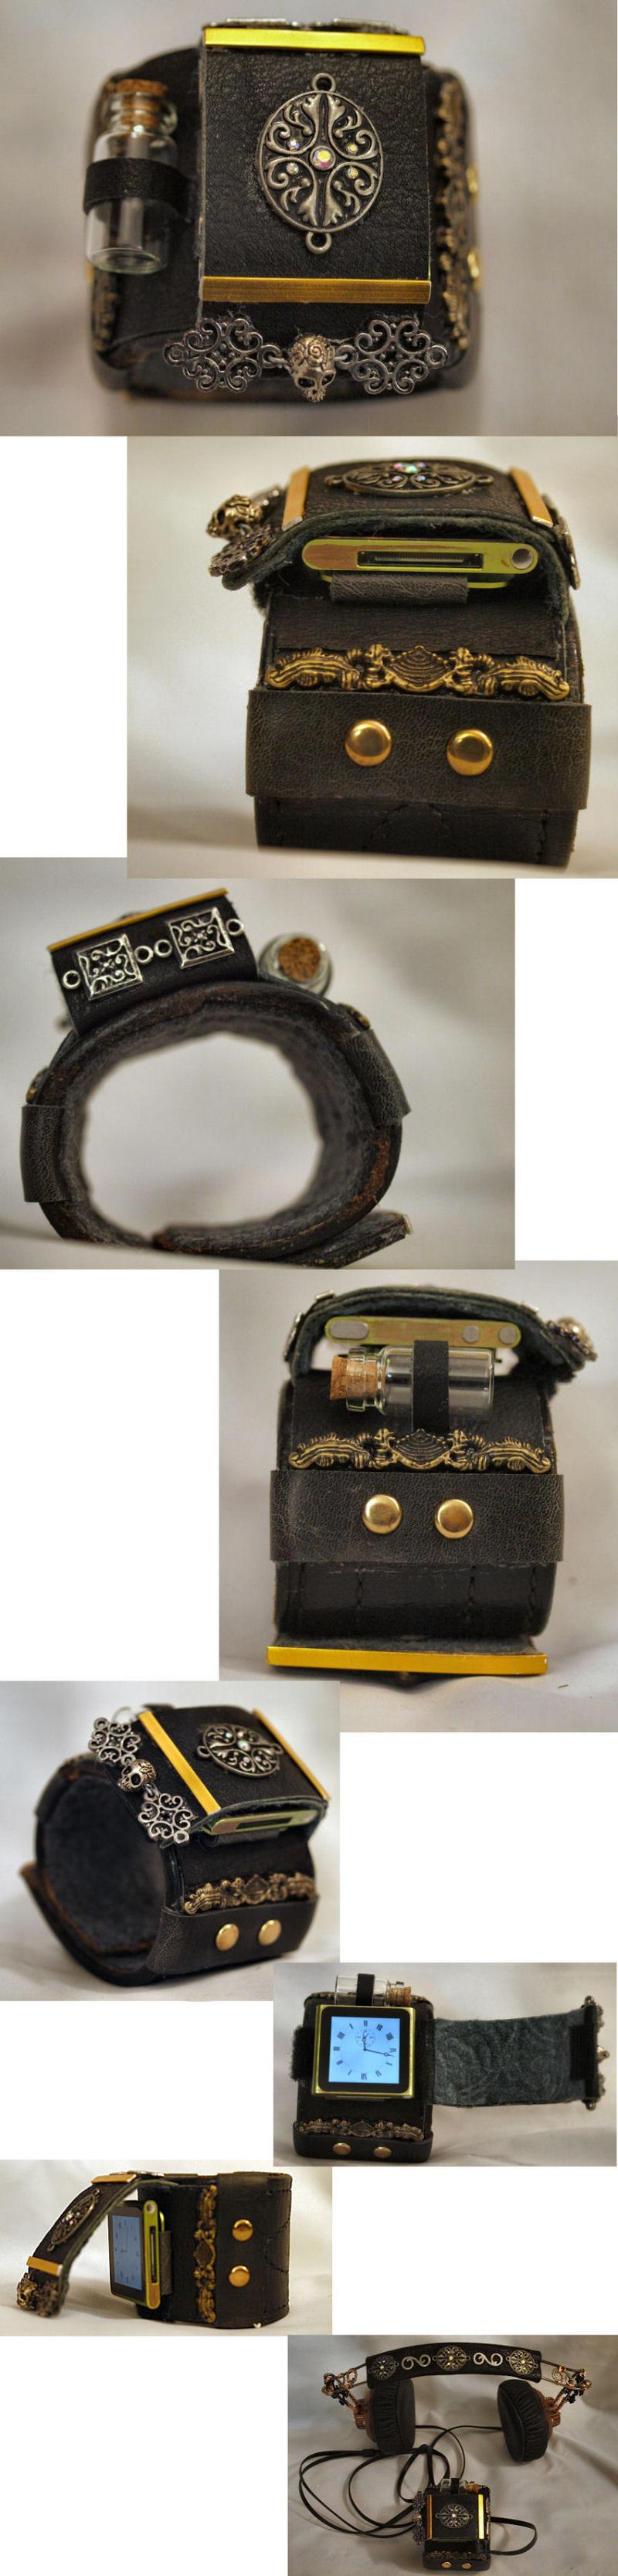 Steampunk Wrist Bracer by ajldesign